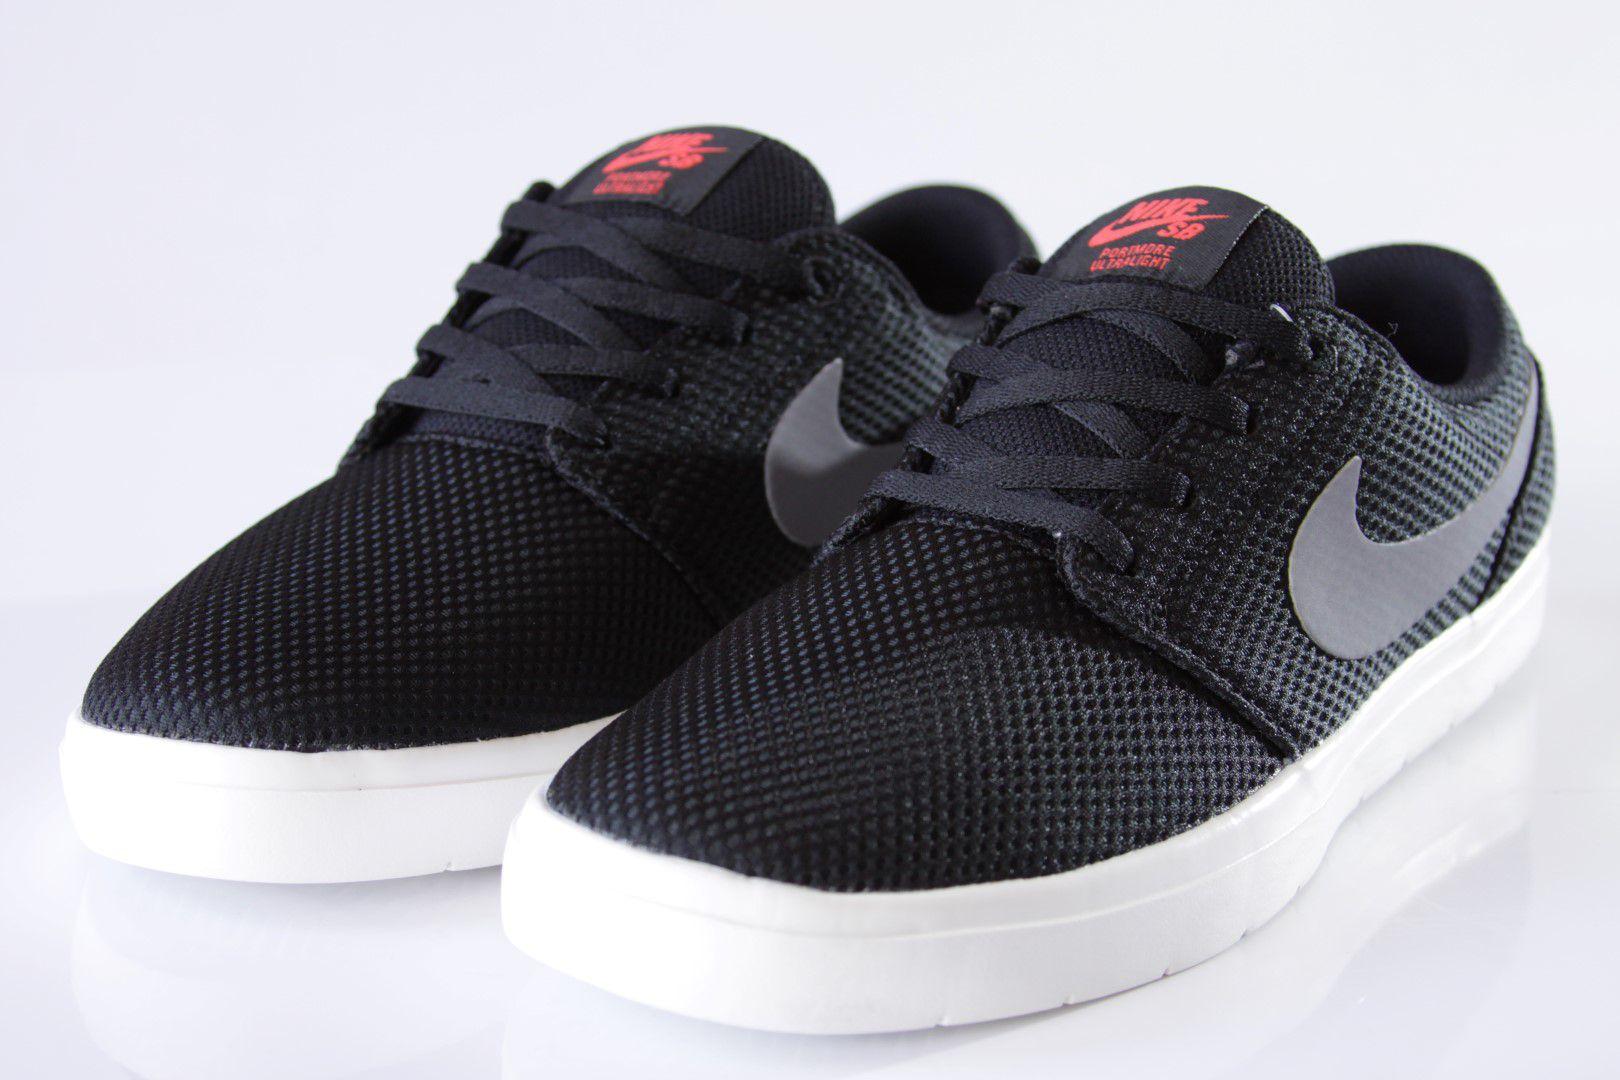 Tênis Nike SB - Portmore II Ultralight Black/Gunsmoke  - No Comply Skate Shop